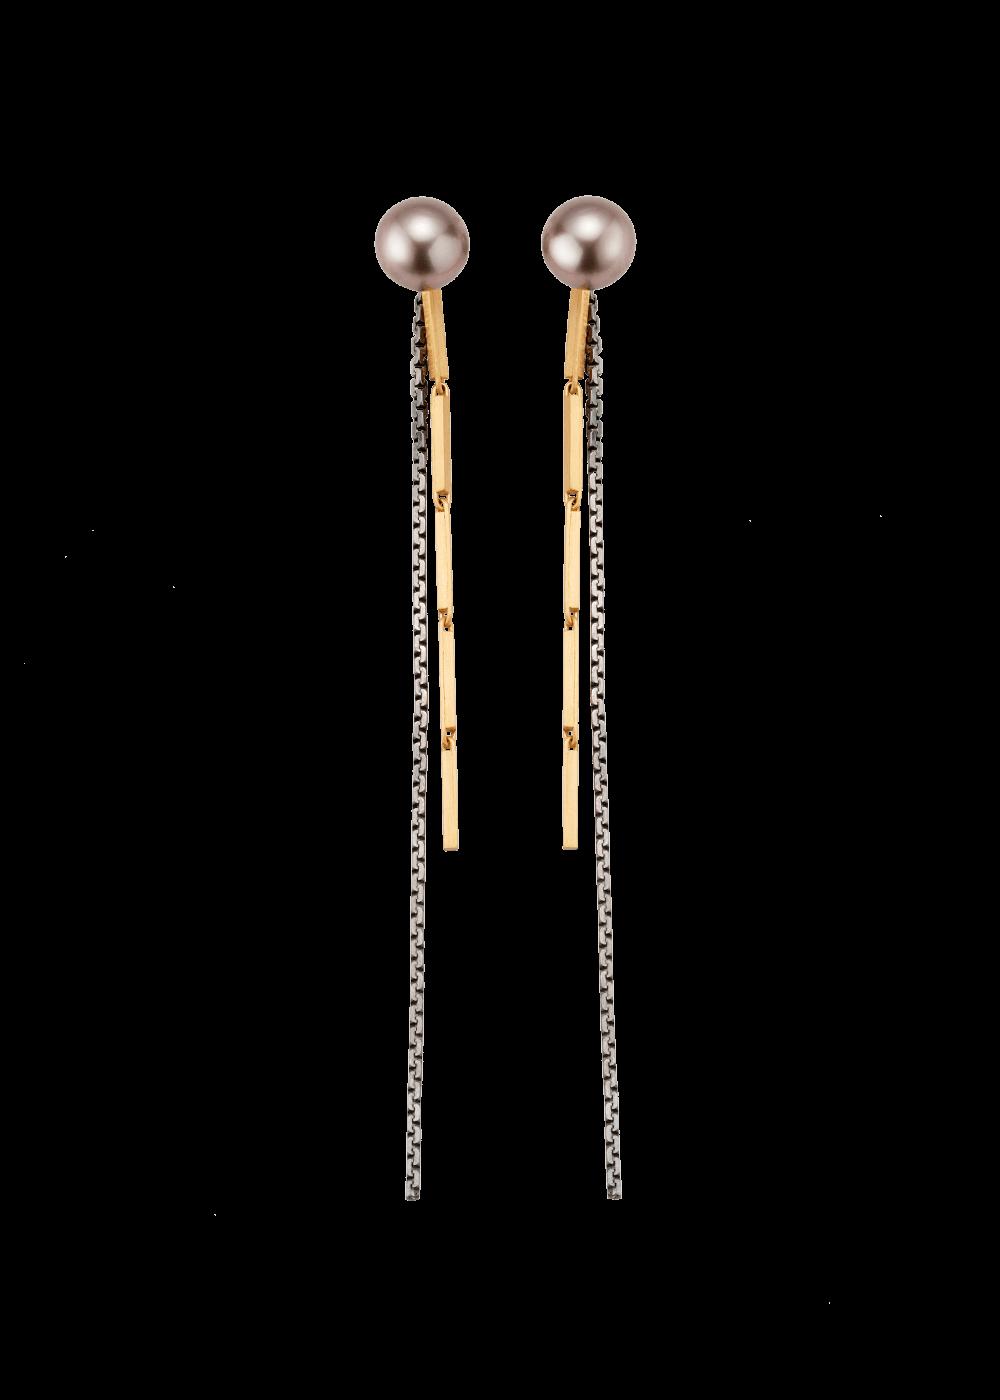 Gellner Ohrschmuck mit Perlen